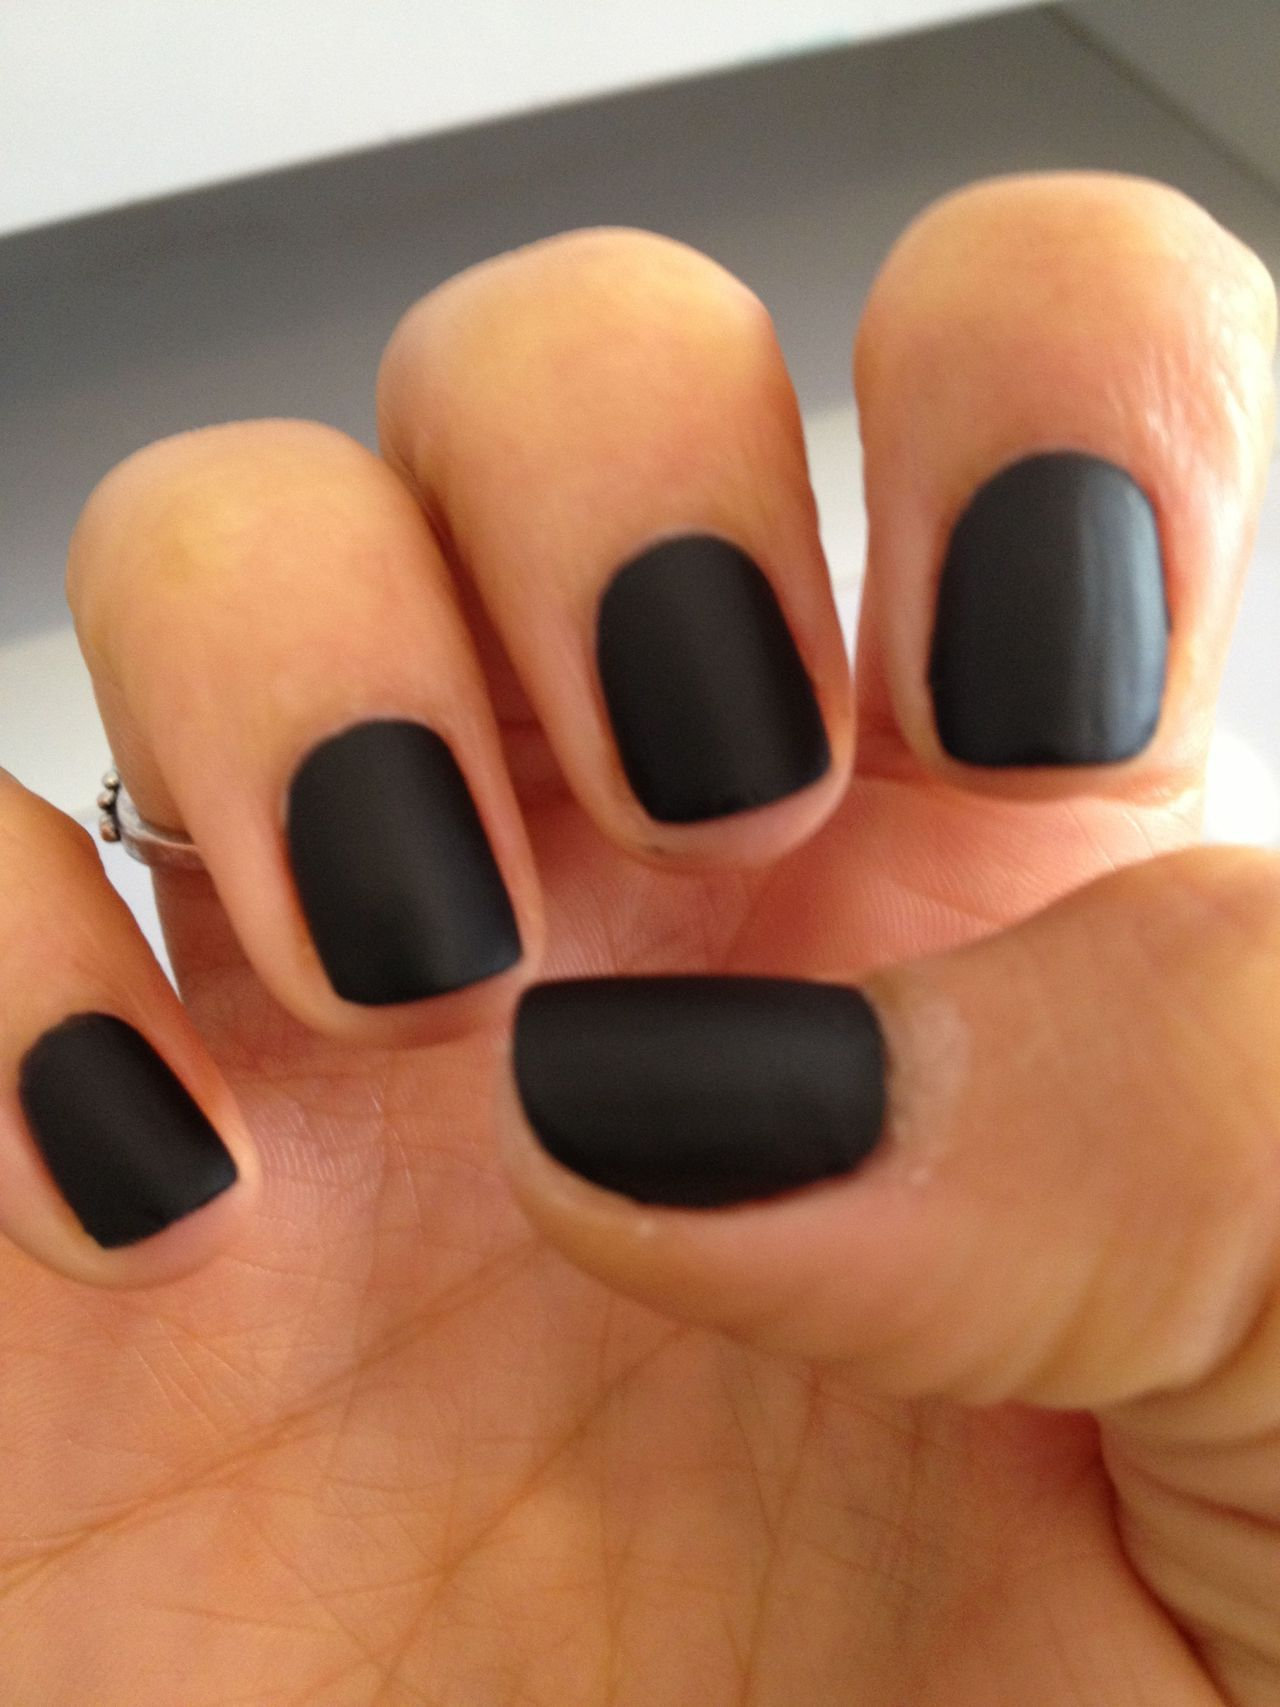 This black nail polish | Uñas | Pinterest | Matte black nail polish ...